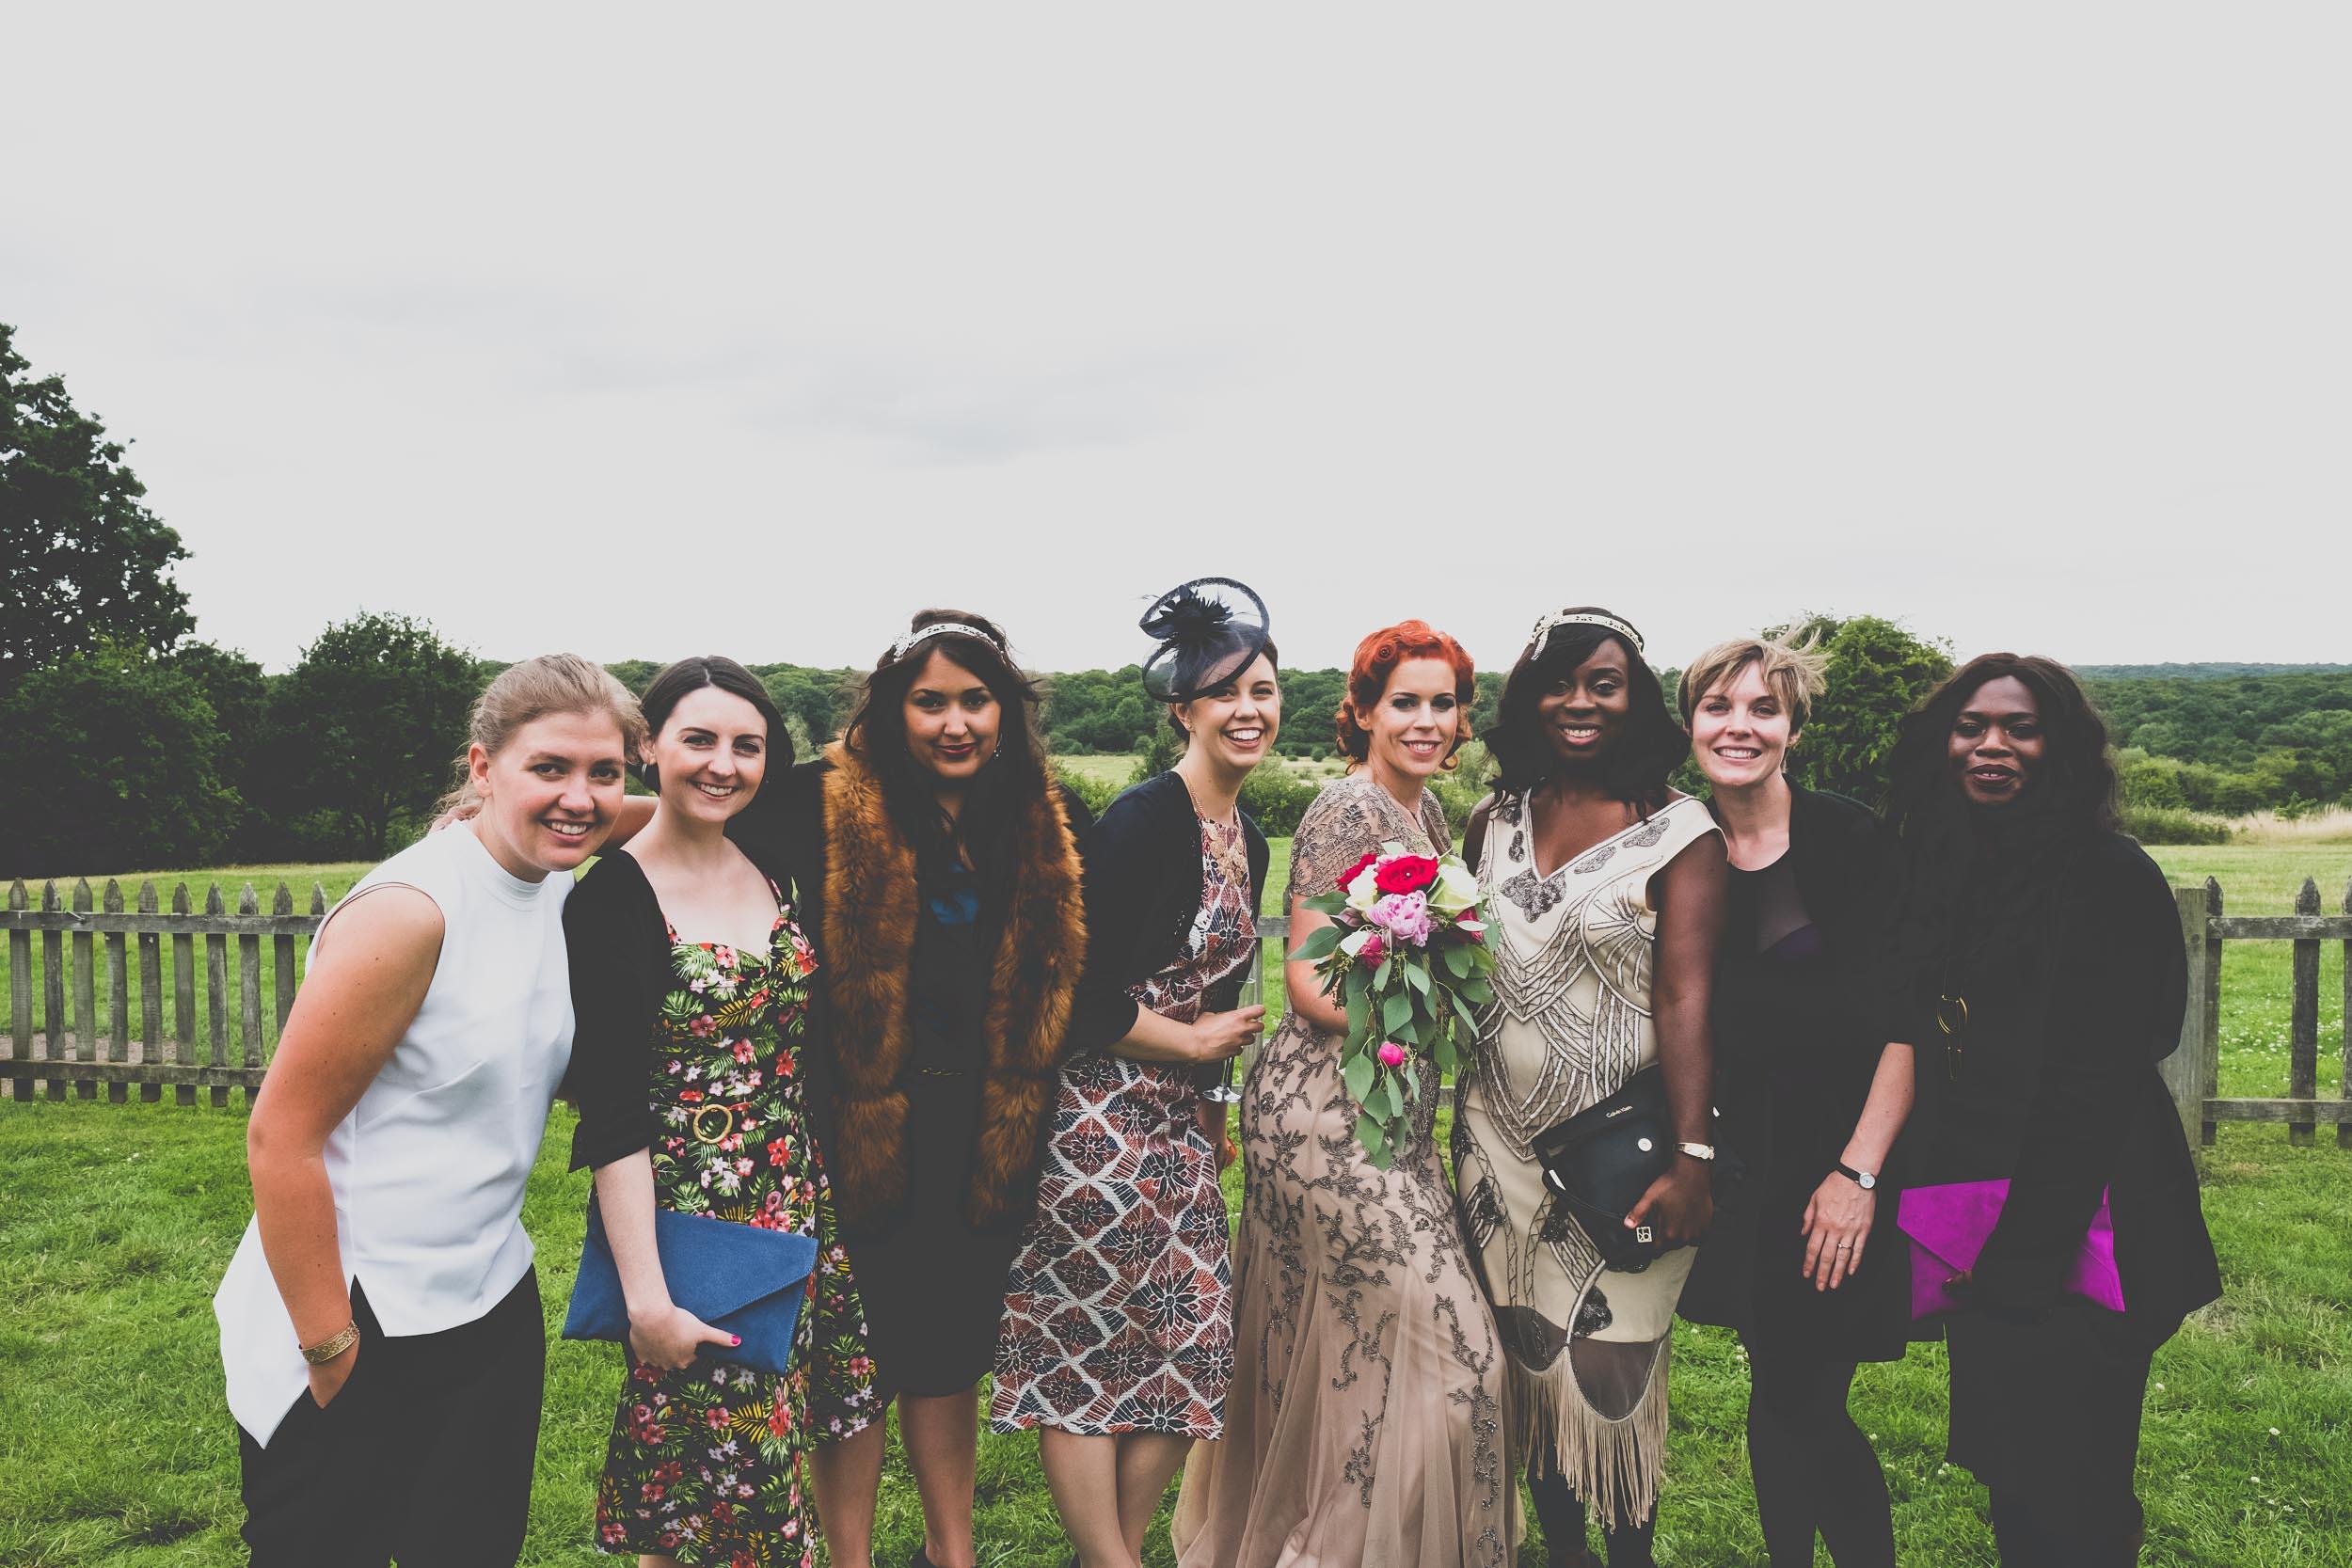 queen-elizabeths-hunting-lodge-epping-forest-wedding239.jpg